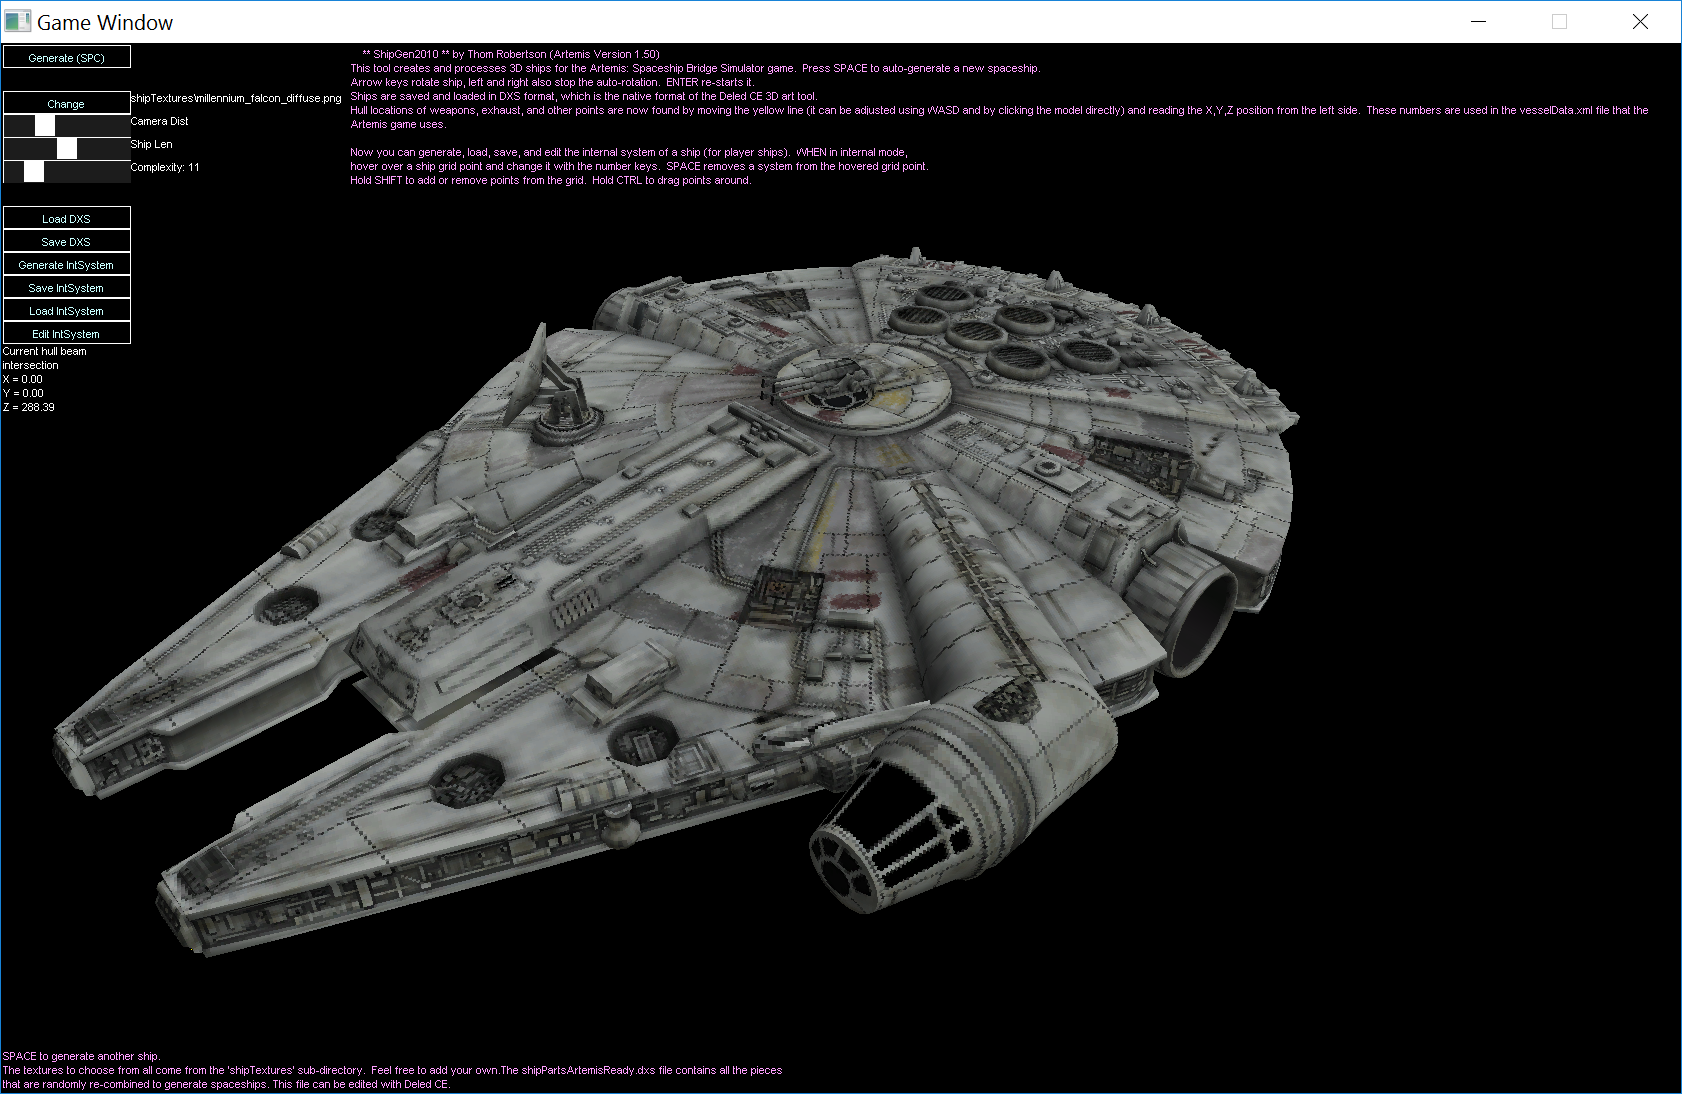 millenium_falcon-screenshot-002.png